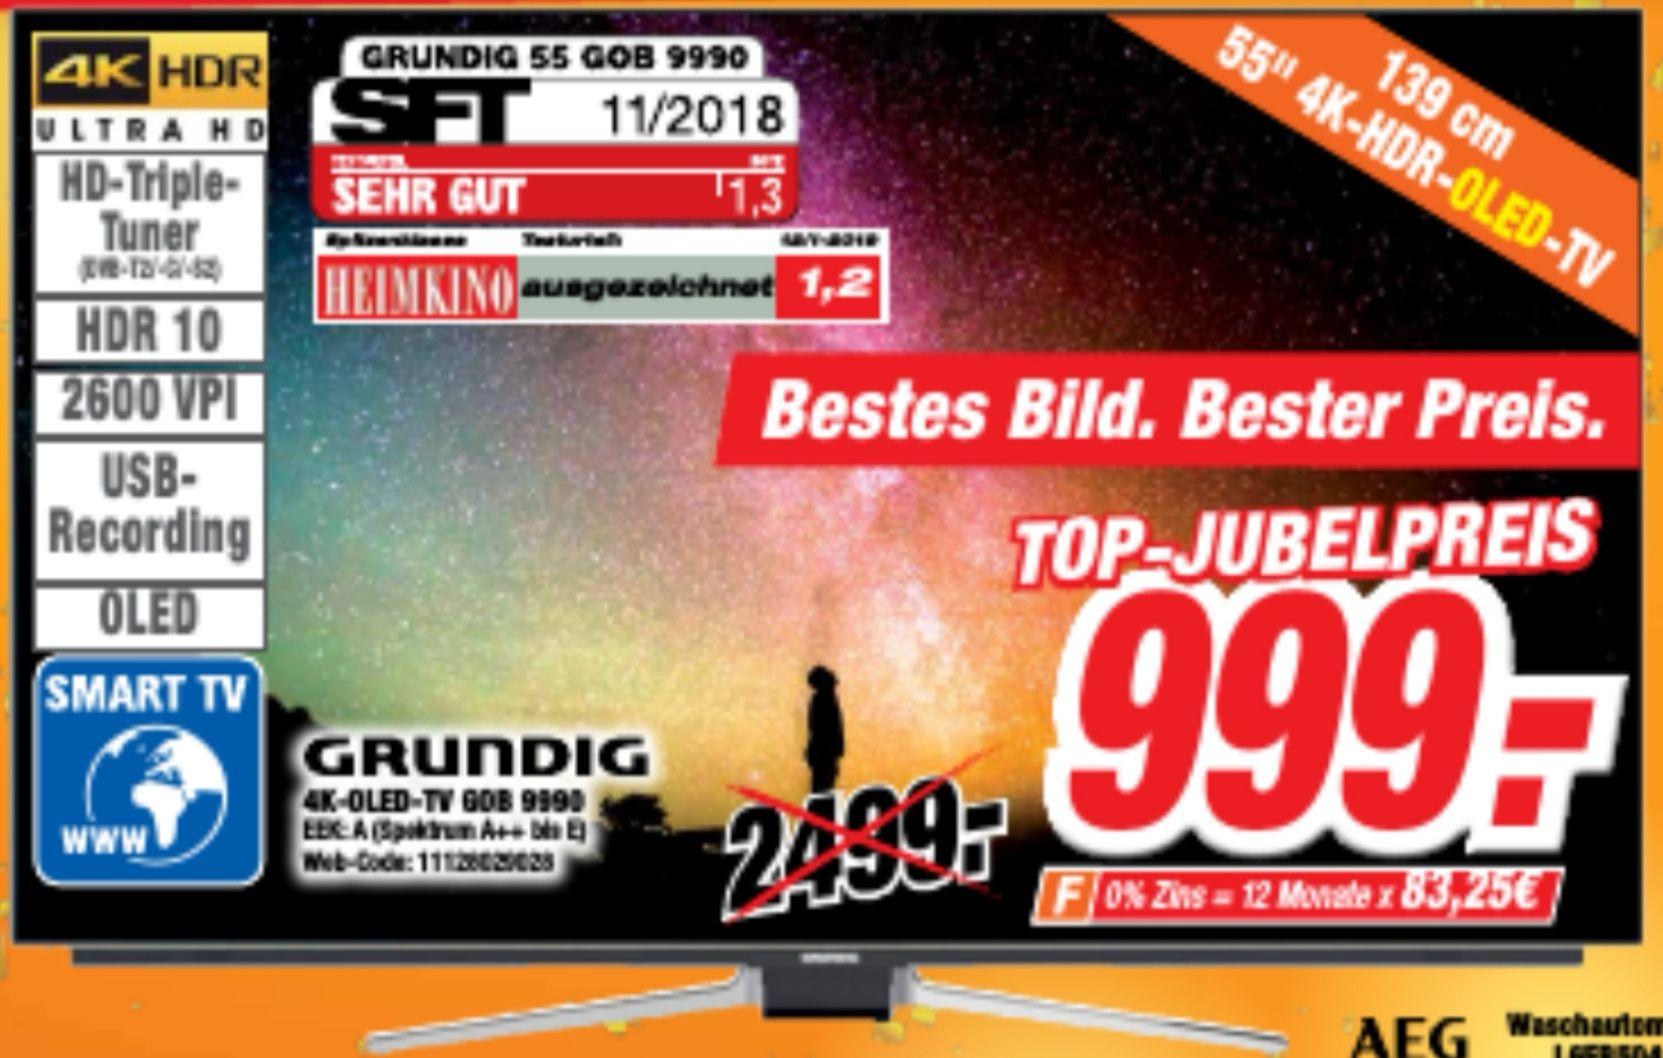 GRUNDIG 55 GOB 9990 FINE ARTS, 139 CM (55 ZOLL), UHD 4K, SMART TV, OLED TV, DVB-T2 HD, DVB-C, DVB-S, DVB-S2